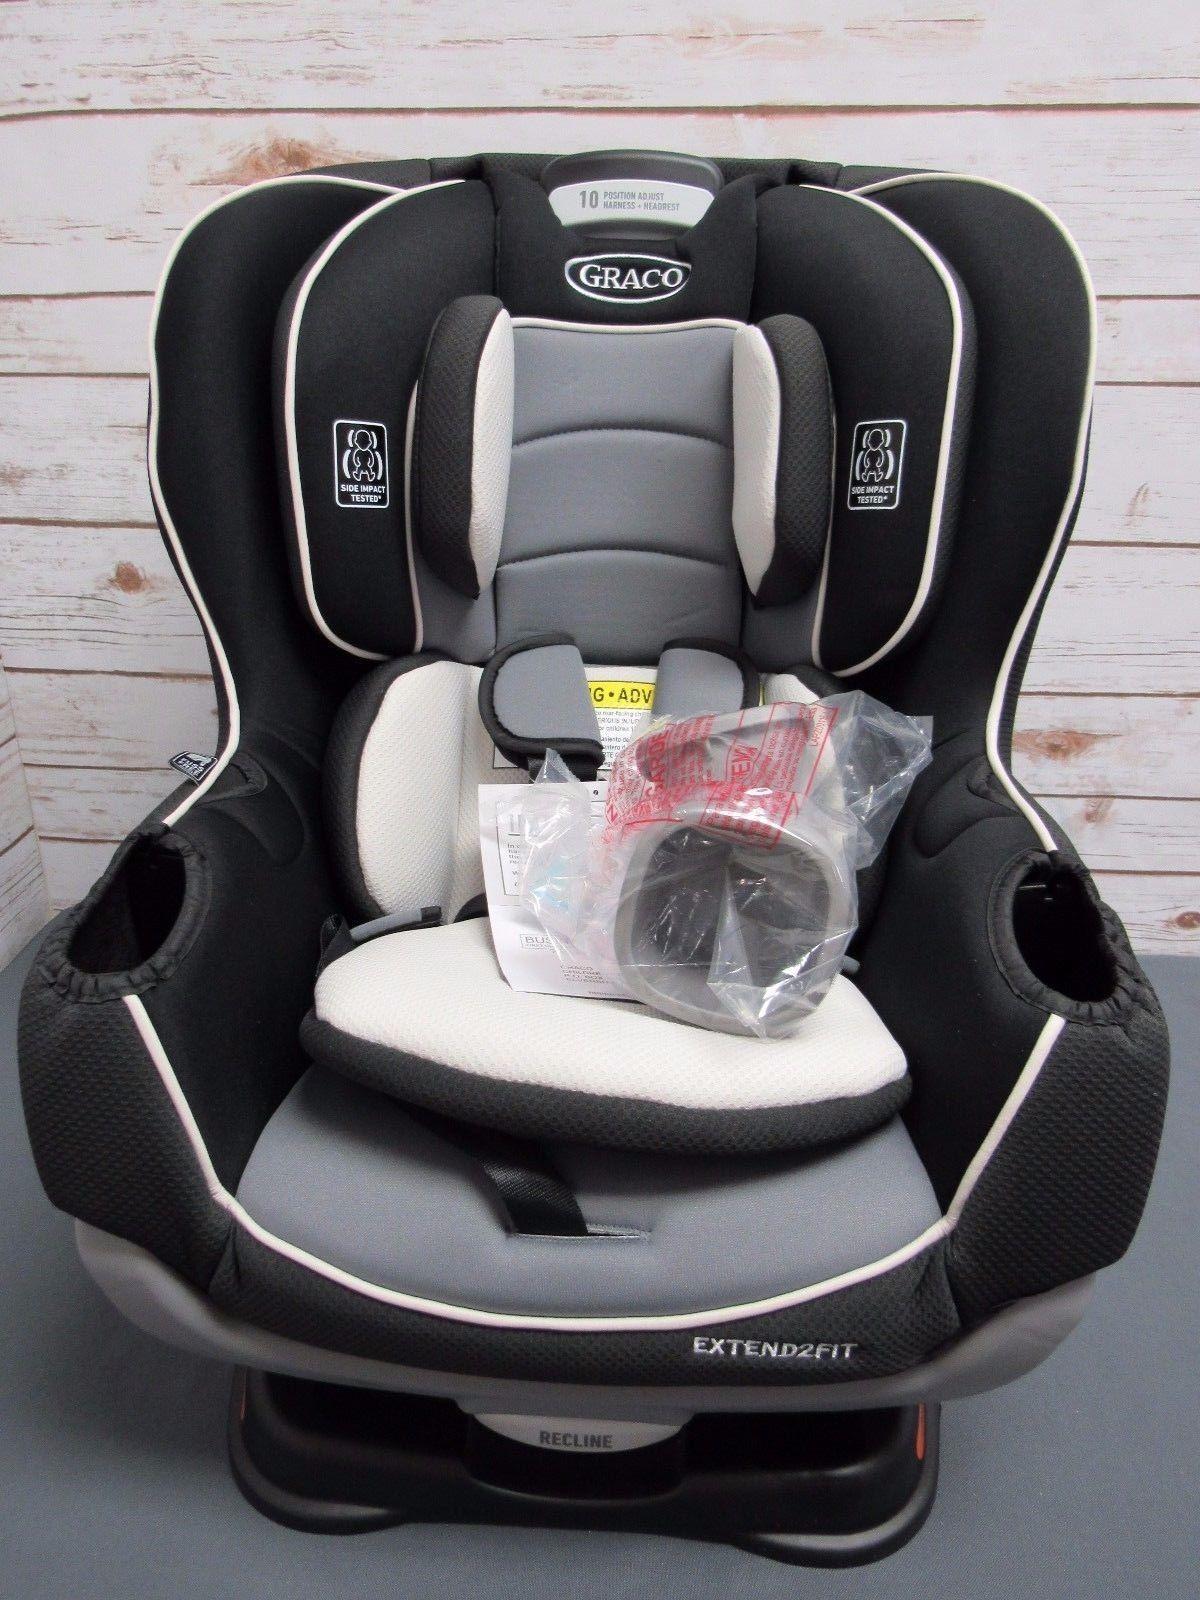 Gotham Gotham Graco Extend2Fit Convertible Car Seat